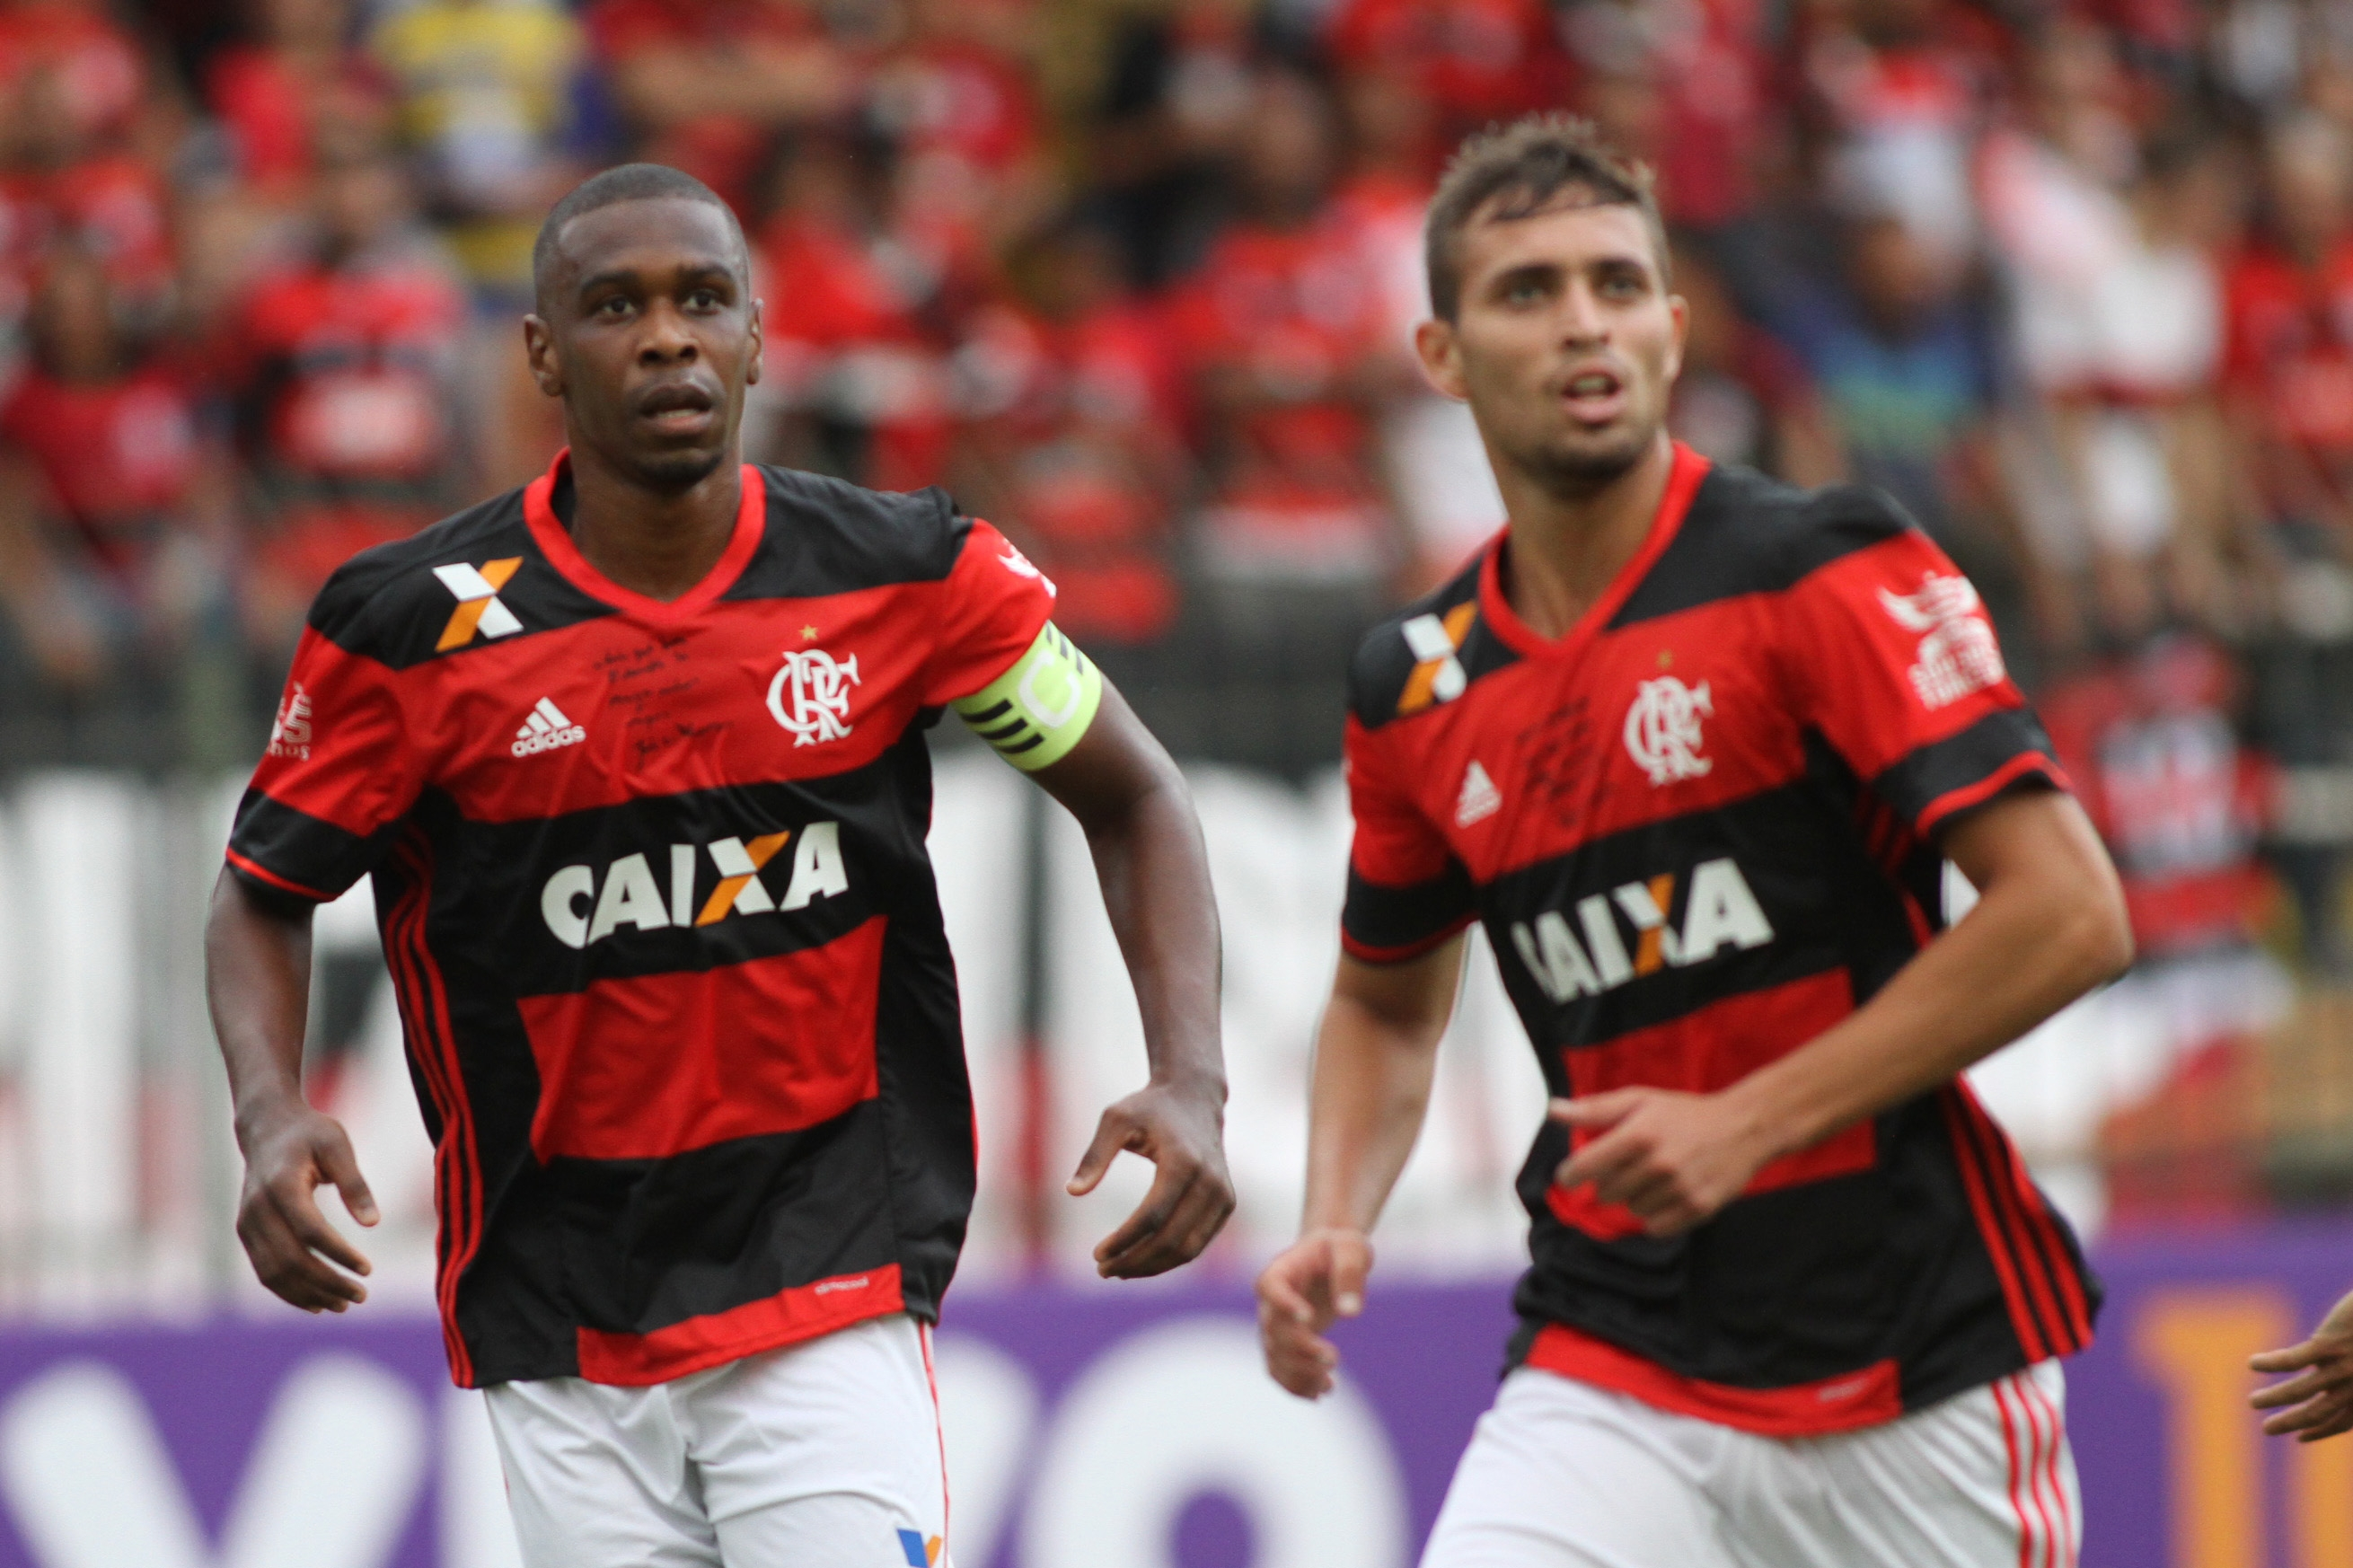 Juan_LeoDuarte_FlamengoxSpor